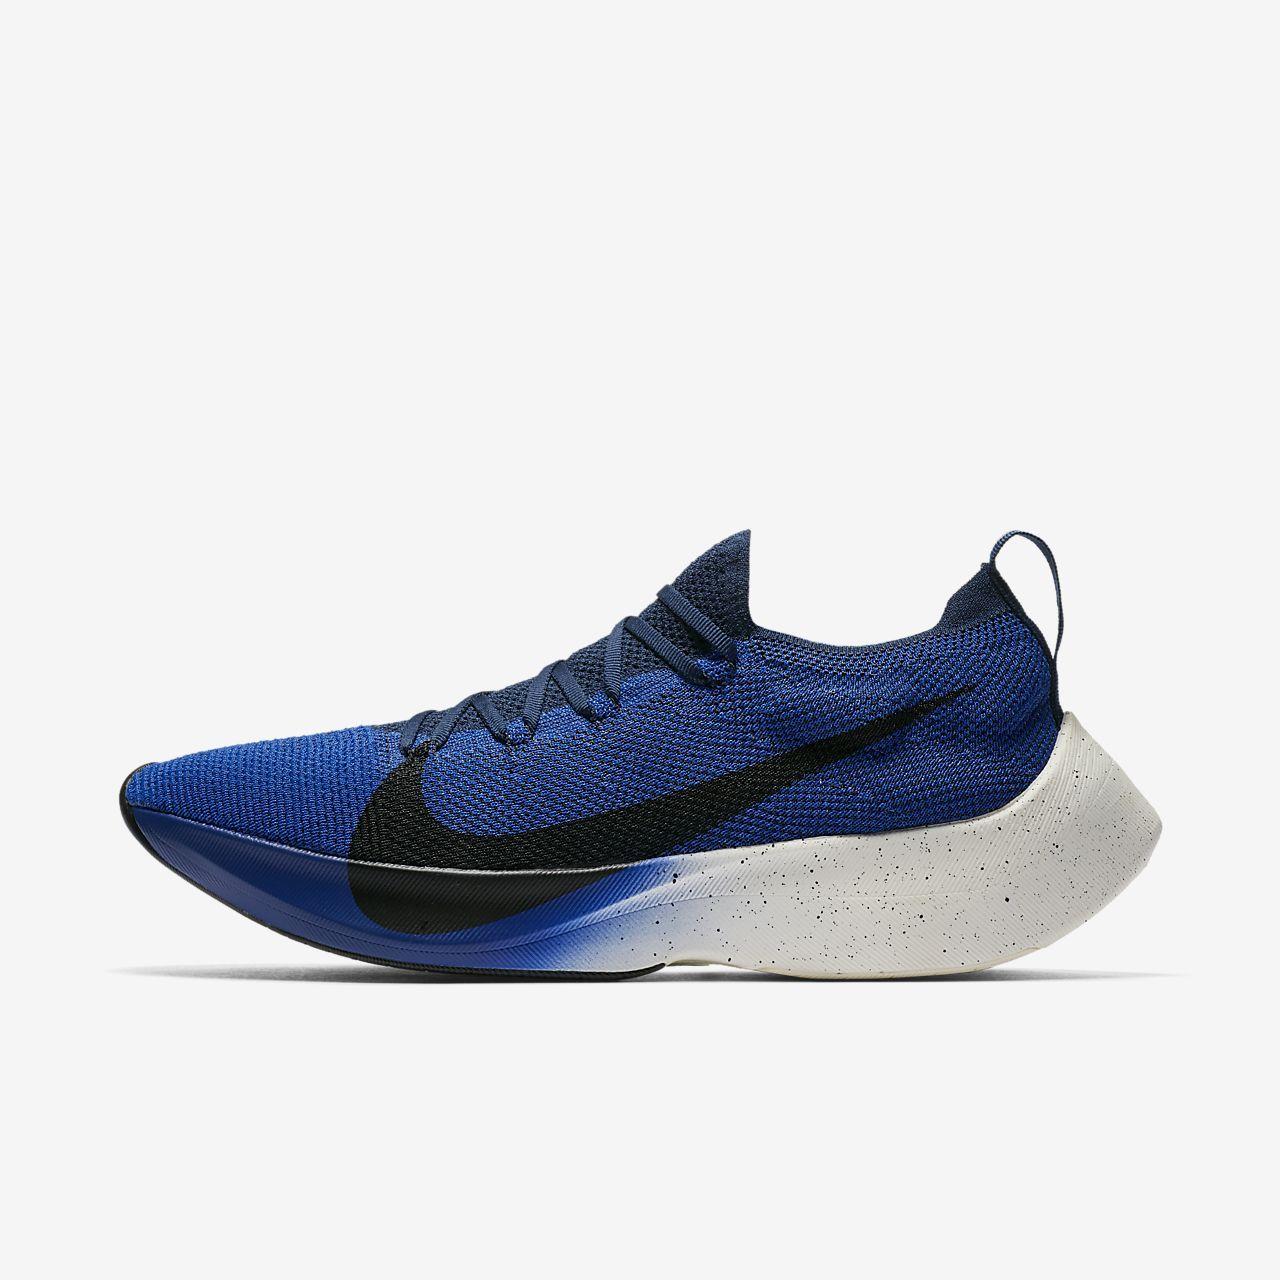 san francisco 3fa0e b82c2 Nike React Vapor Street Flyknit Men s Shoe